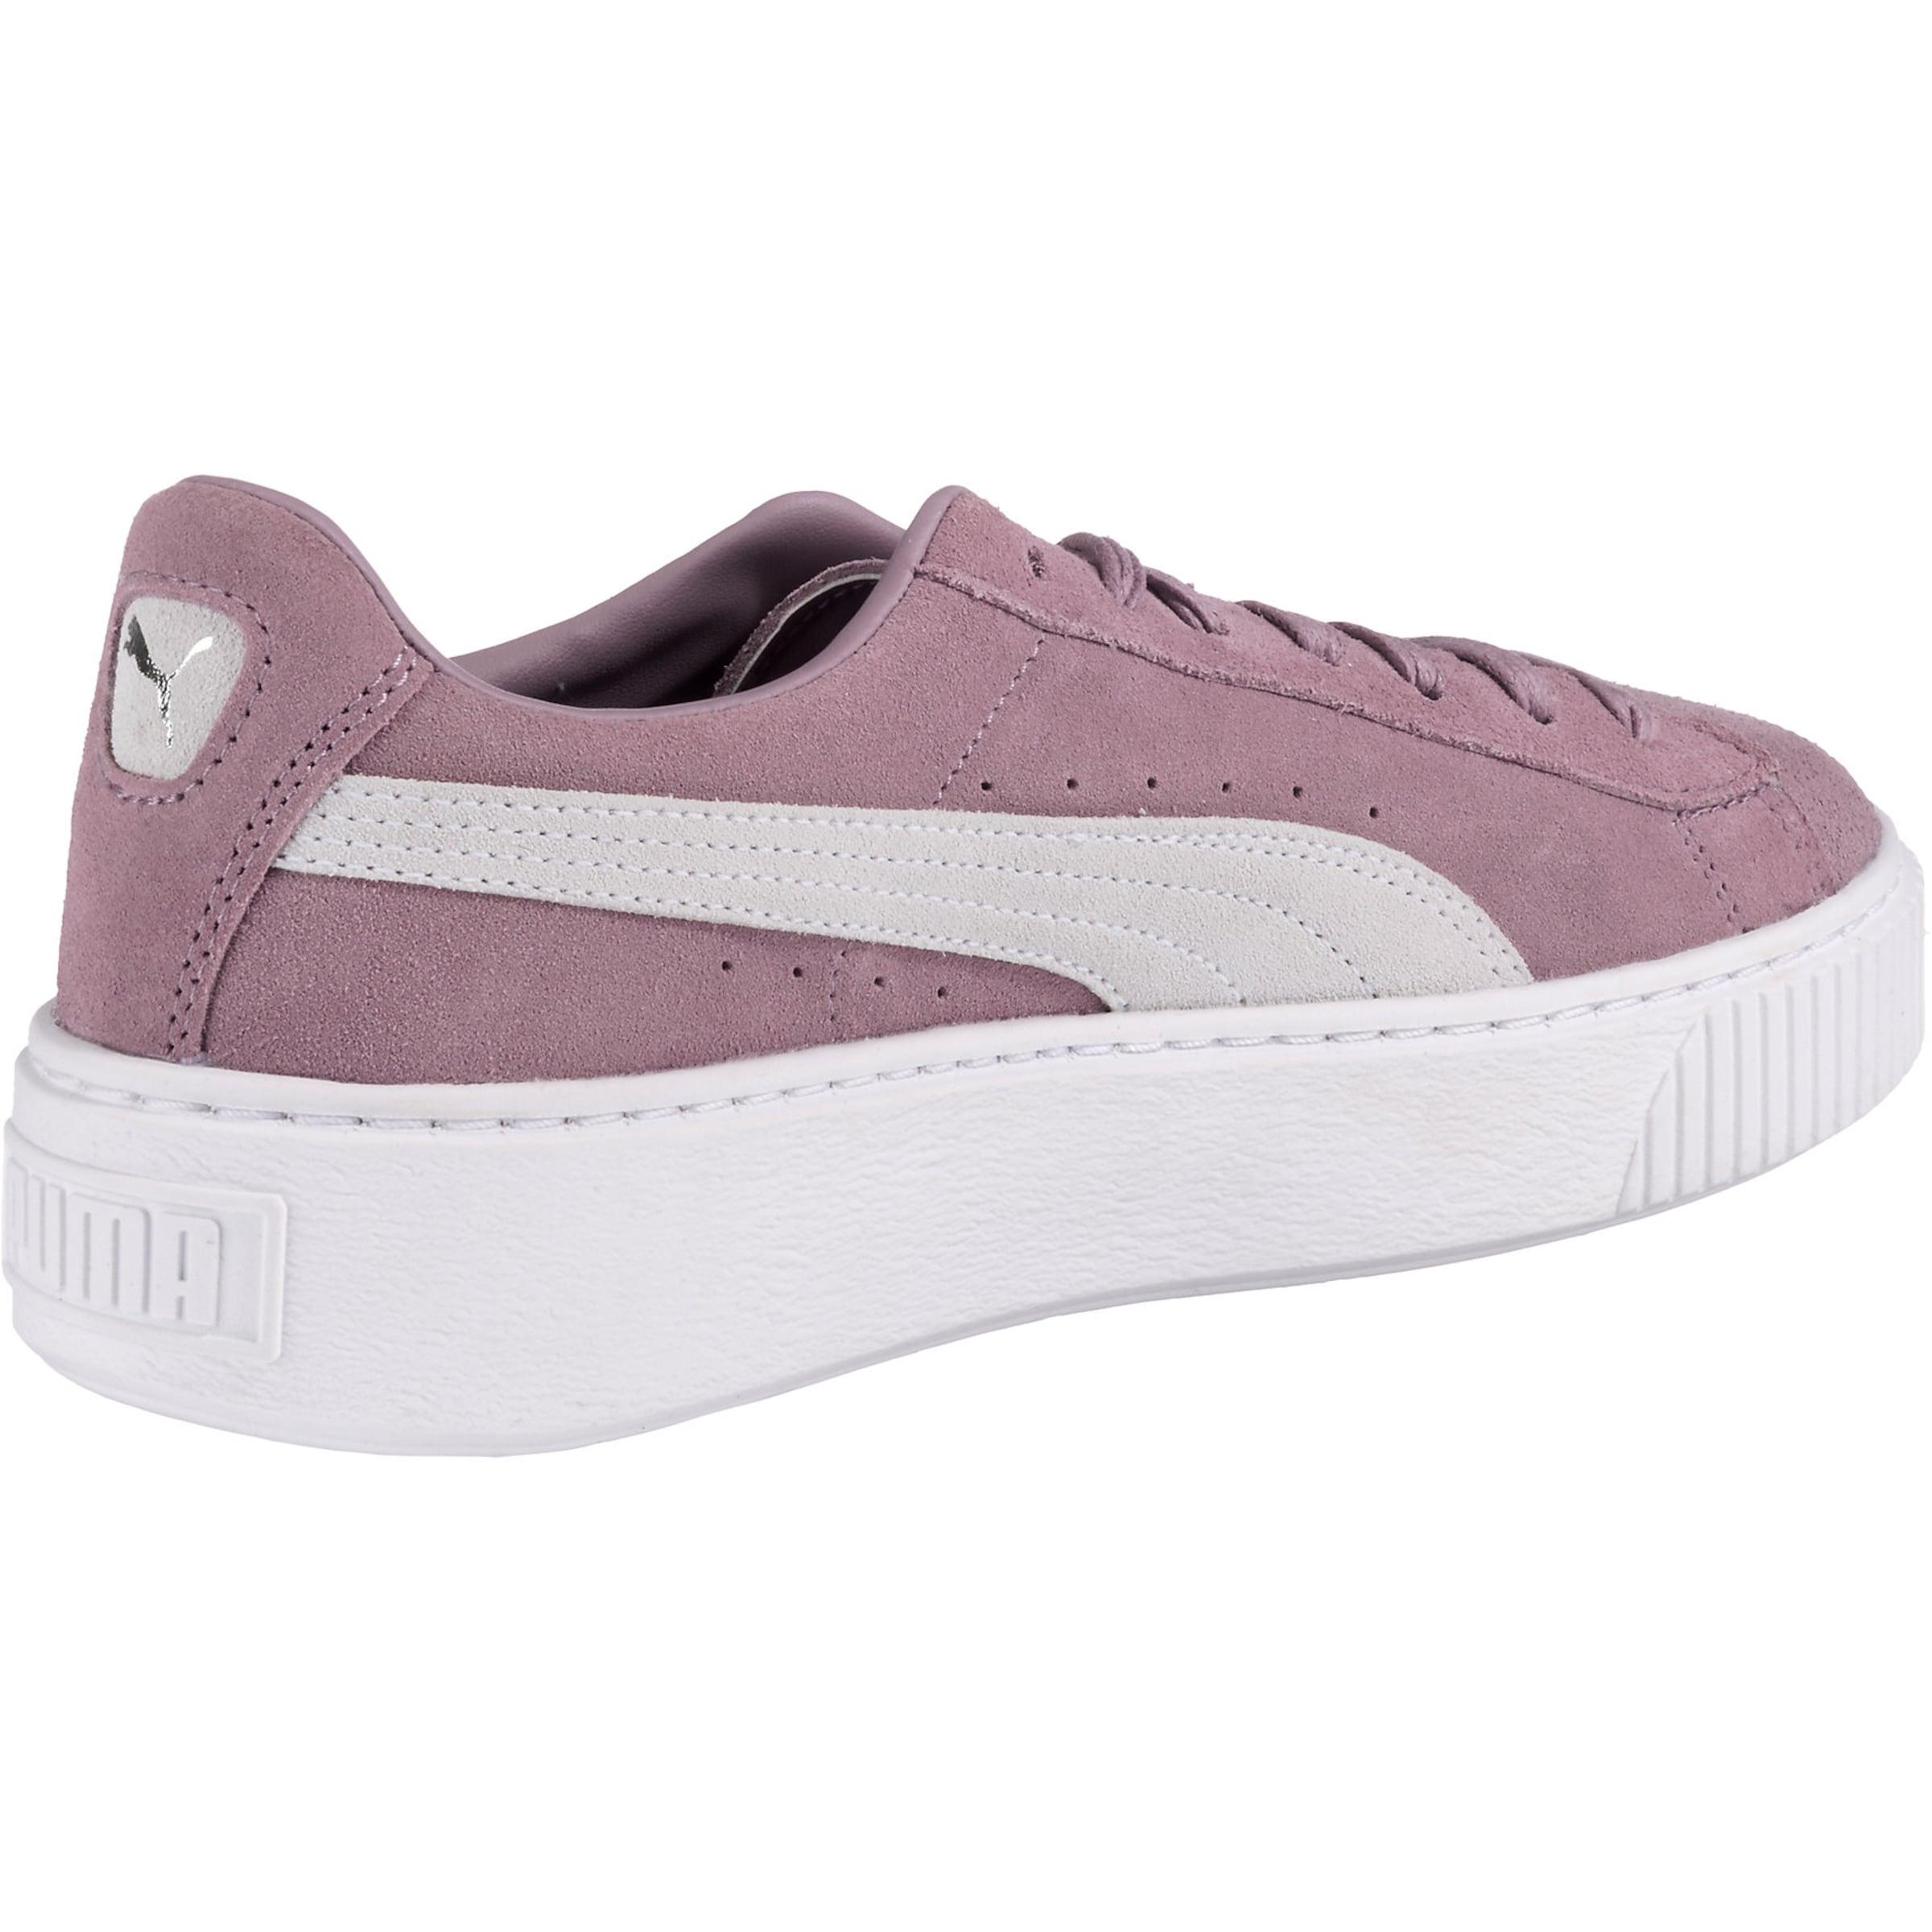 Puma In Sneaker Sneaker Puma 'suede' HelllilaWeiß 08XPnwOk